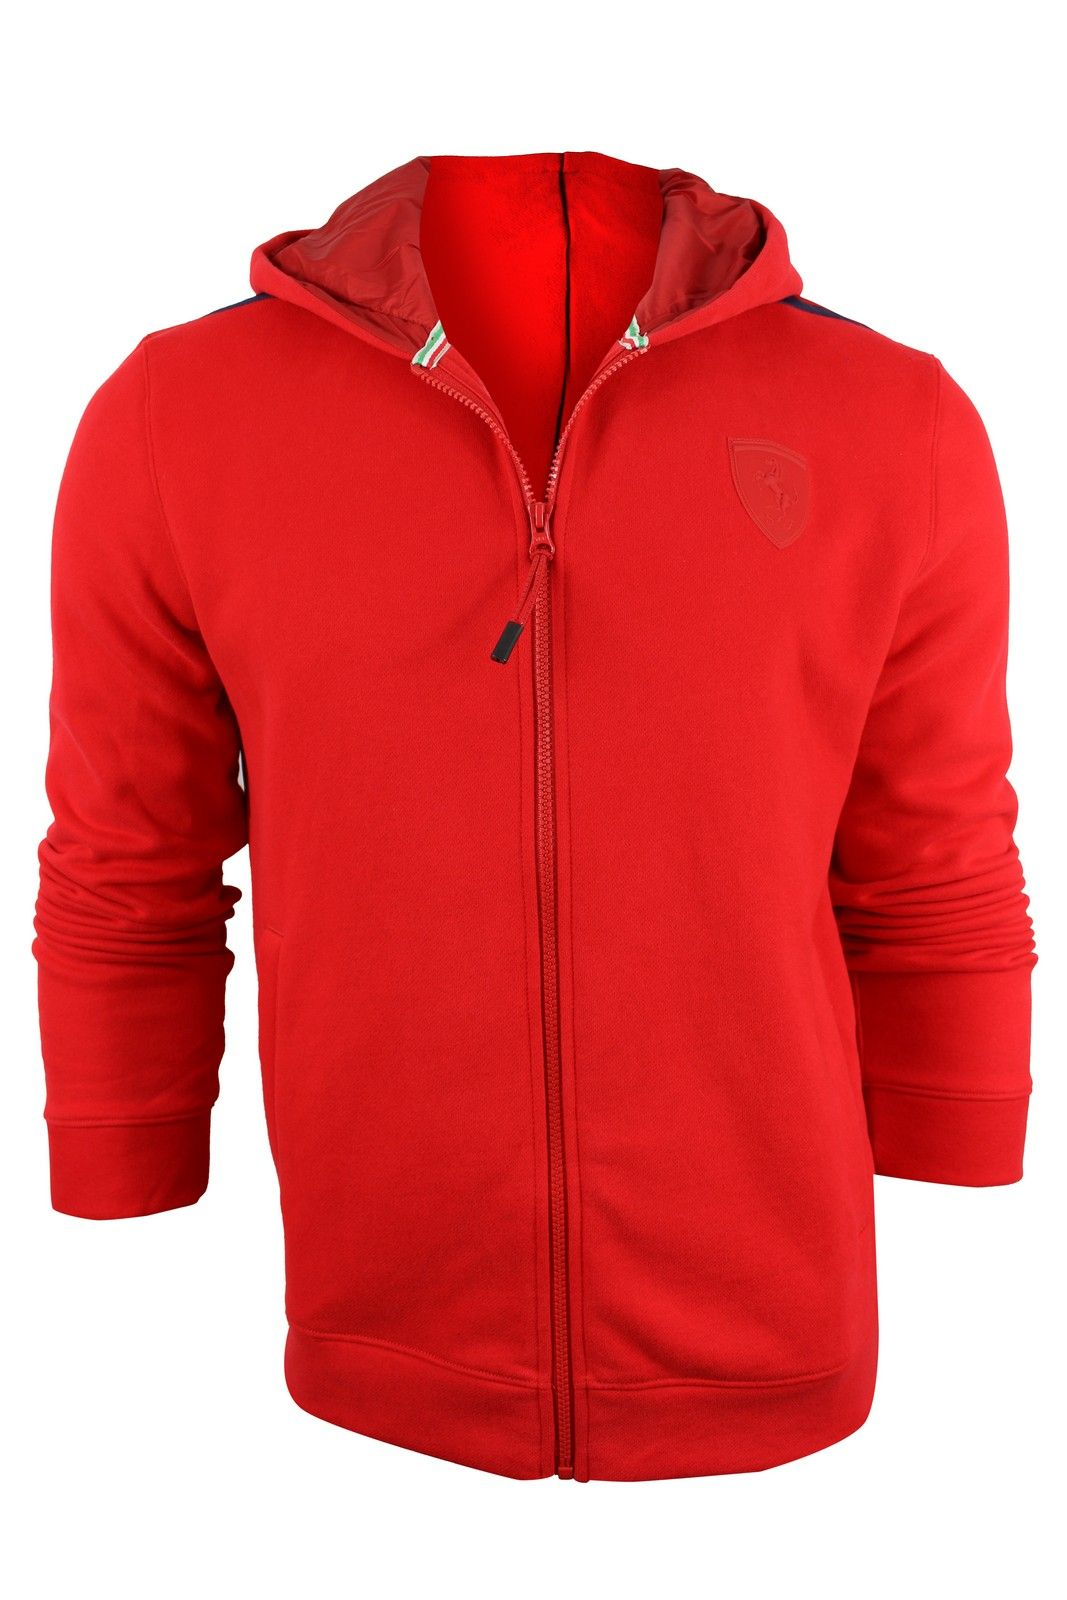 eed249512d4e Puma Men s Red Ferrari Hooded Sweat Jacket